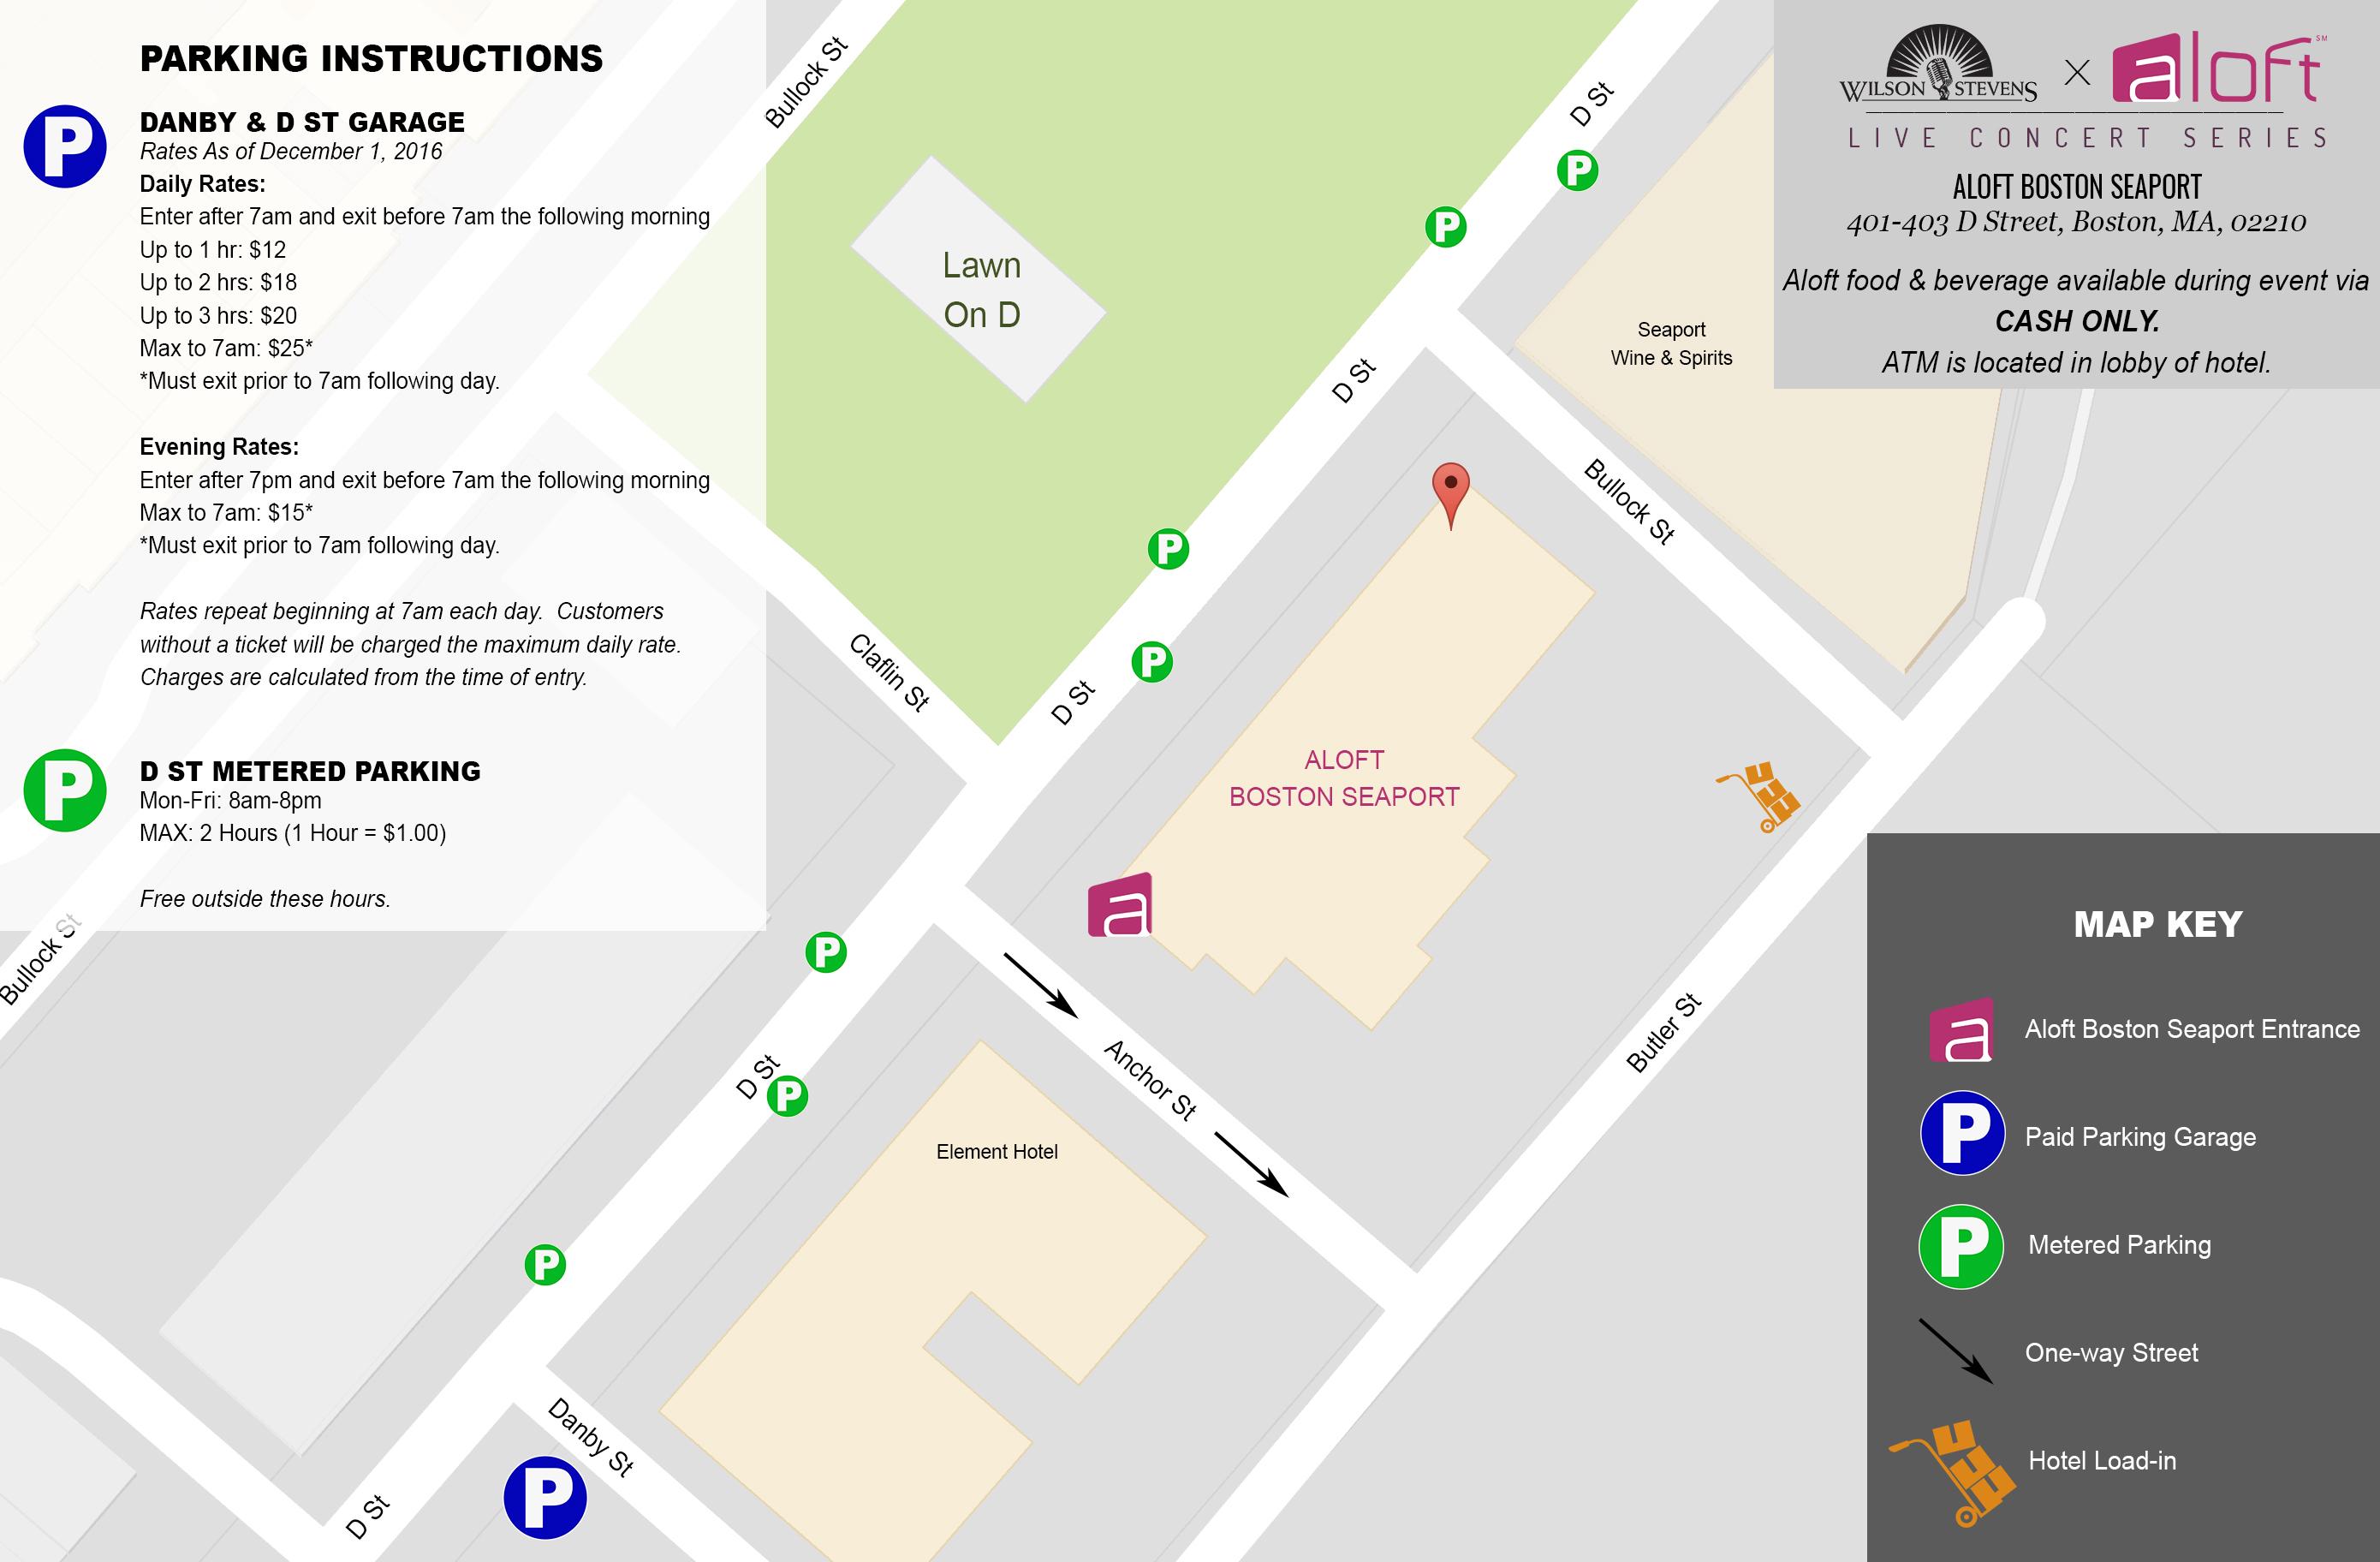 WSXAloft Showcase Parking Map for Bands